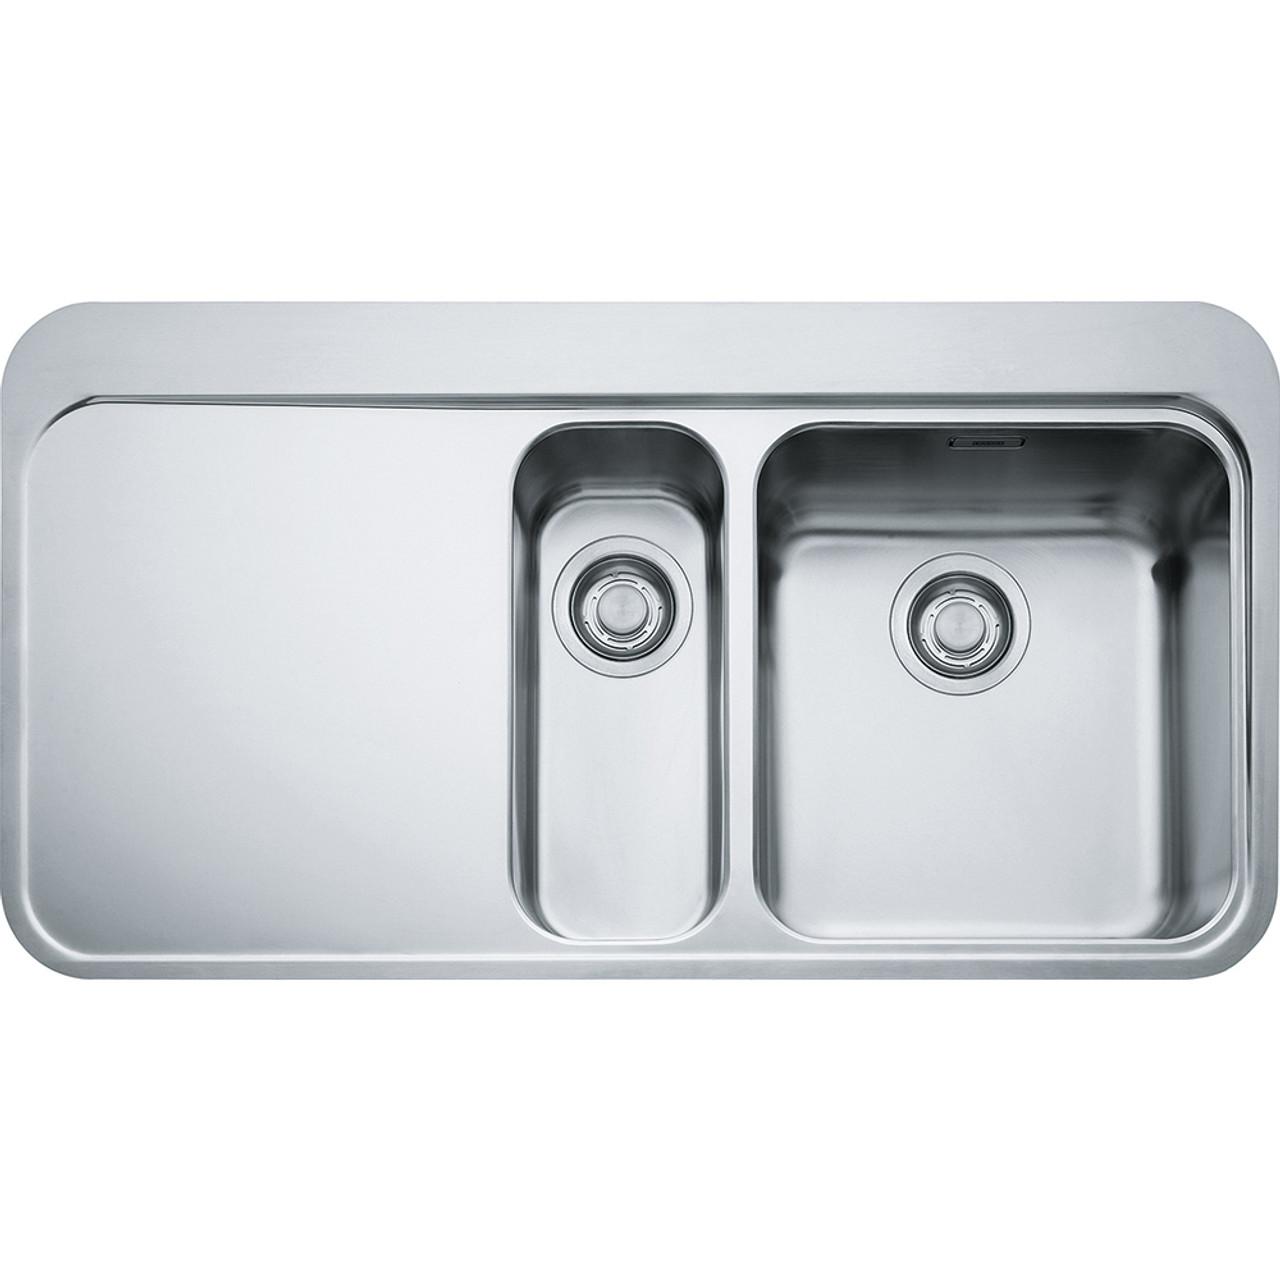 franke sinos snx251 stainless steel kitchen sink sinks. Black Bedroom Furniture Sets. Home Design Ideas